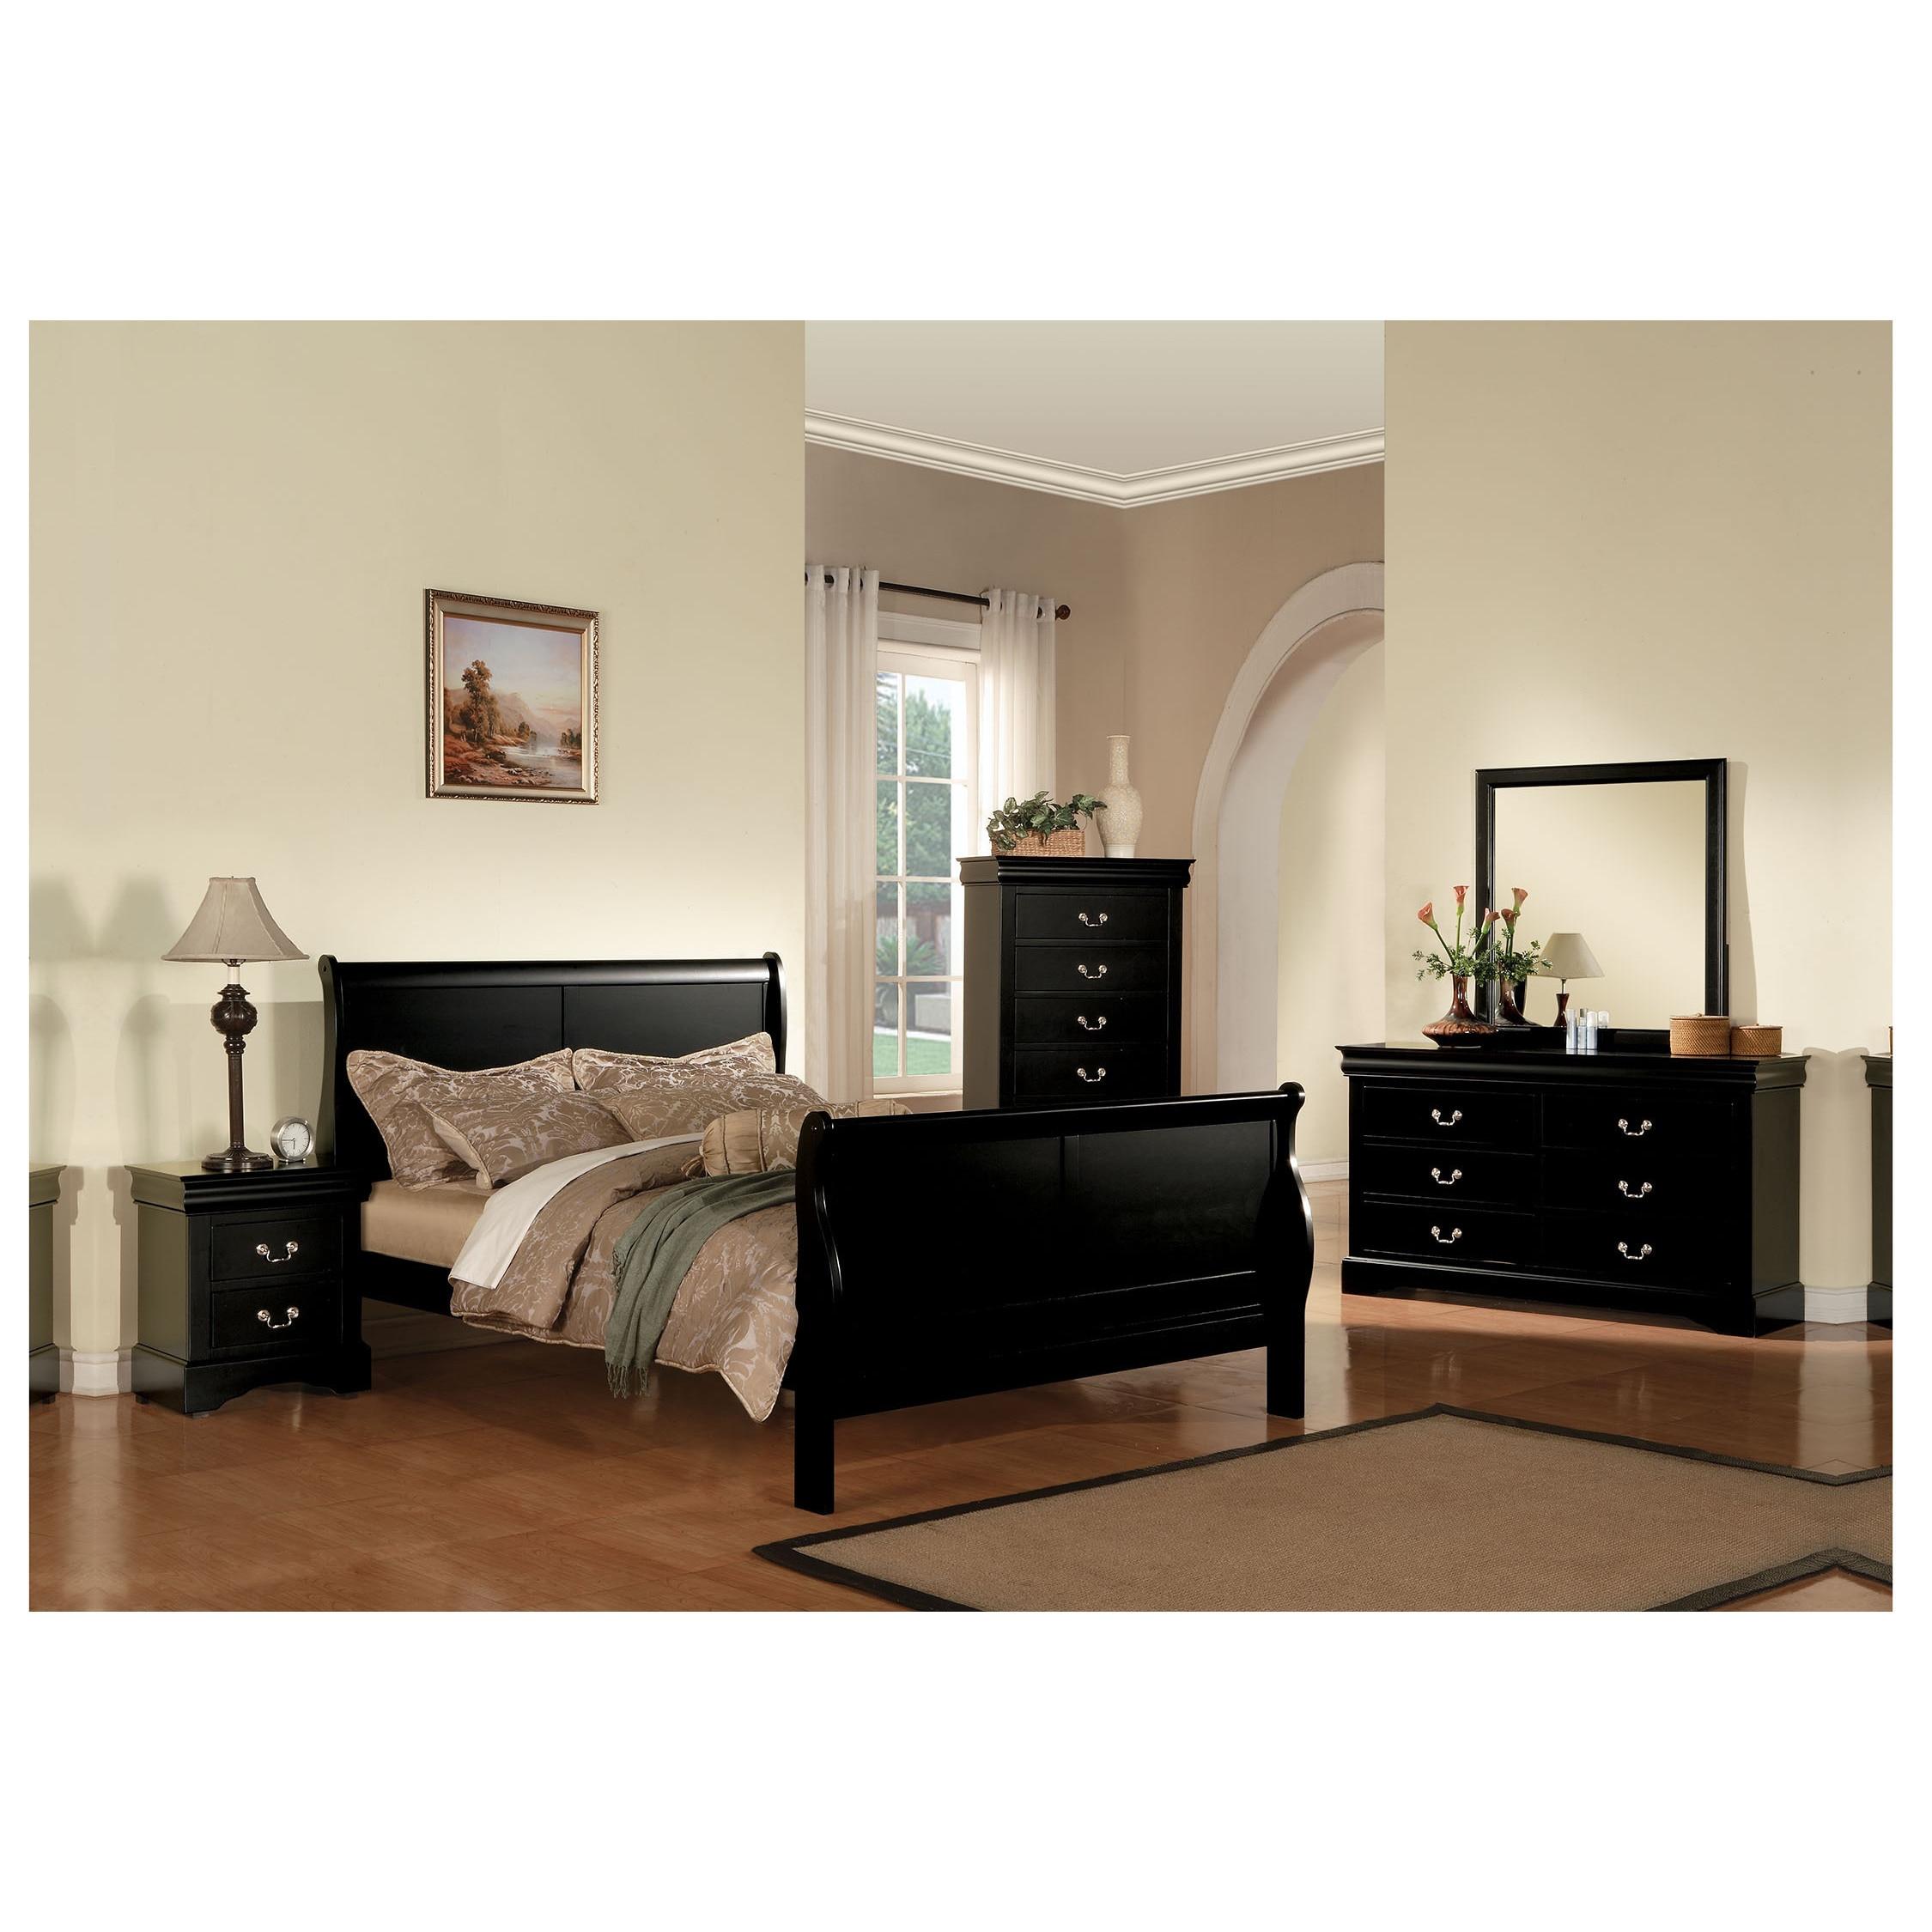 Acme Furniture Louis Philippe III Black 4-Piece Bedroom Set | eBay